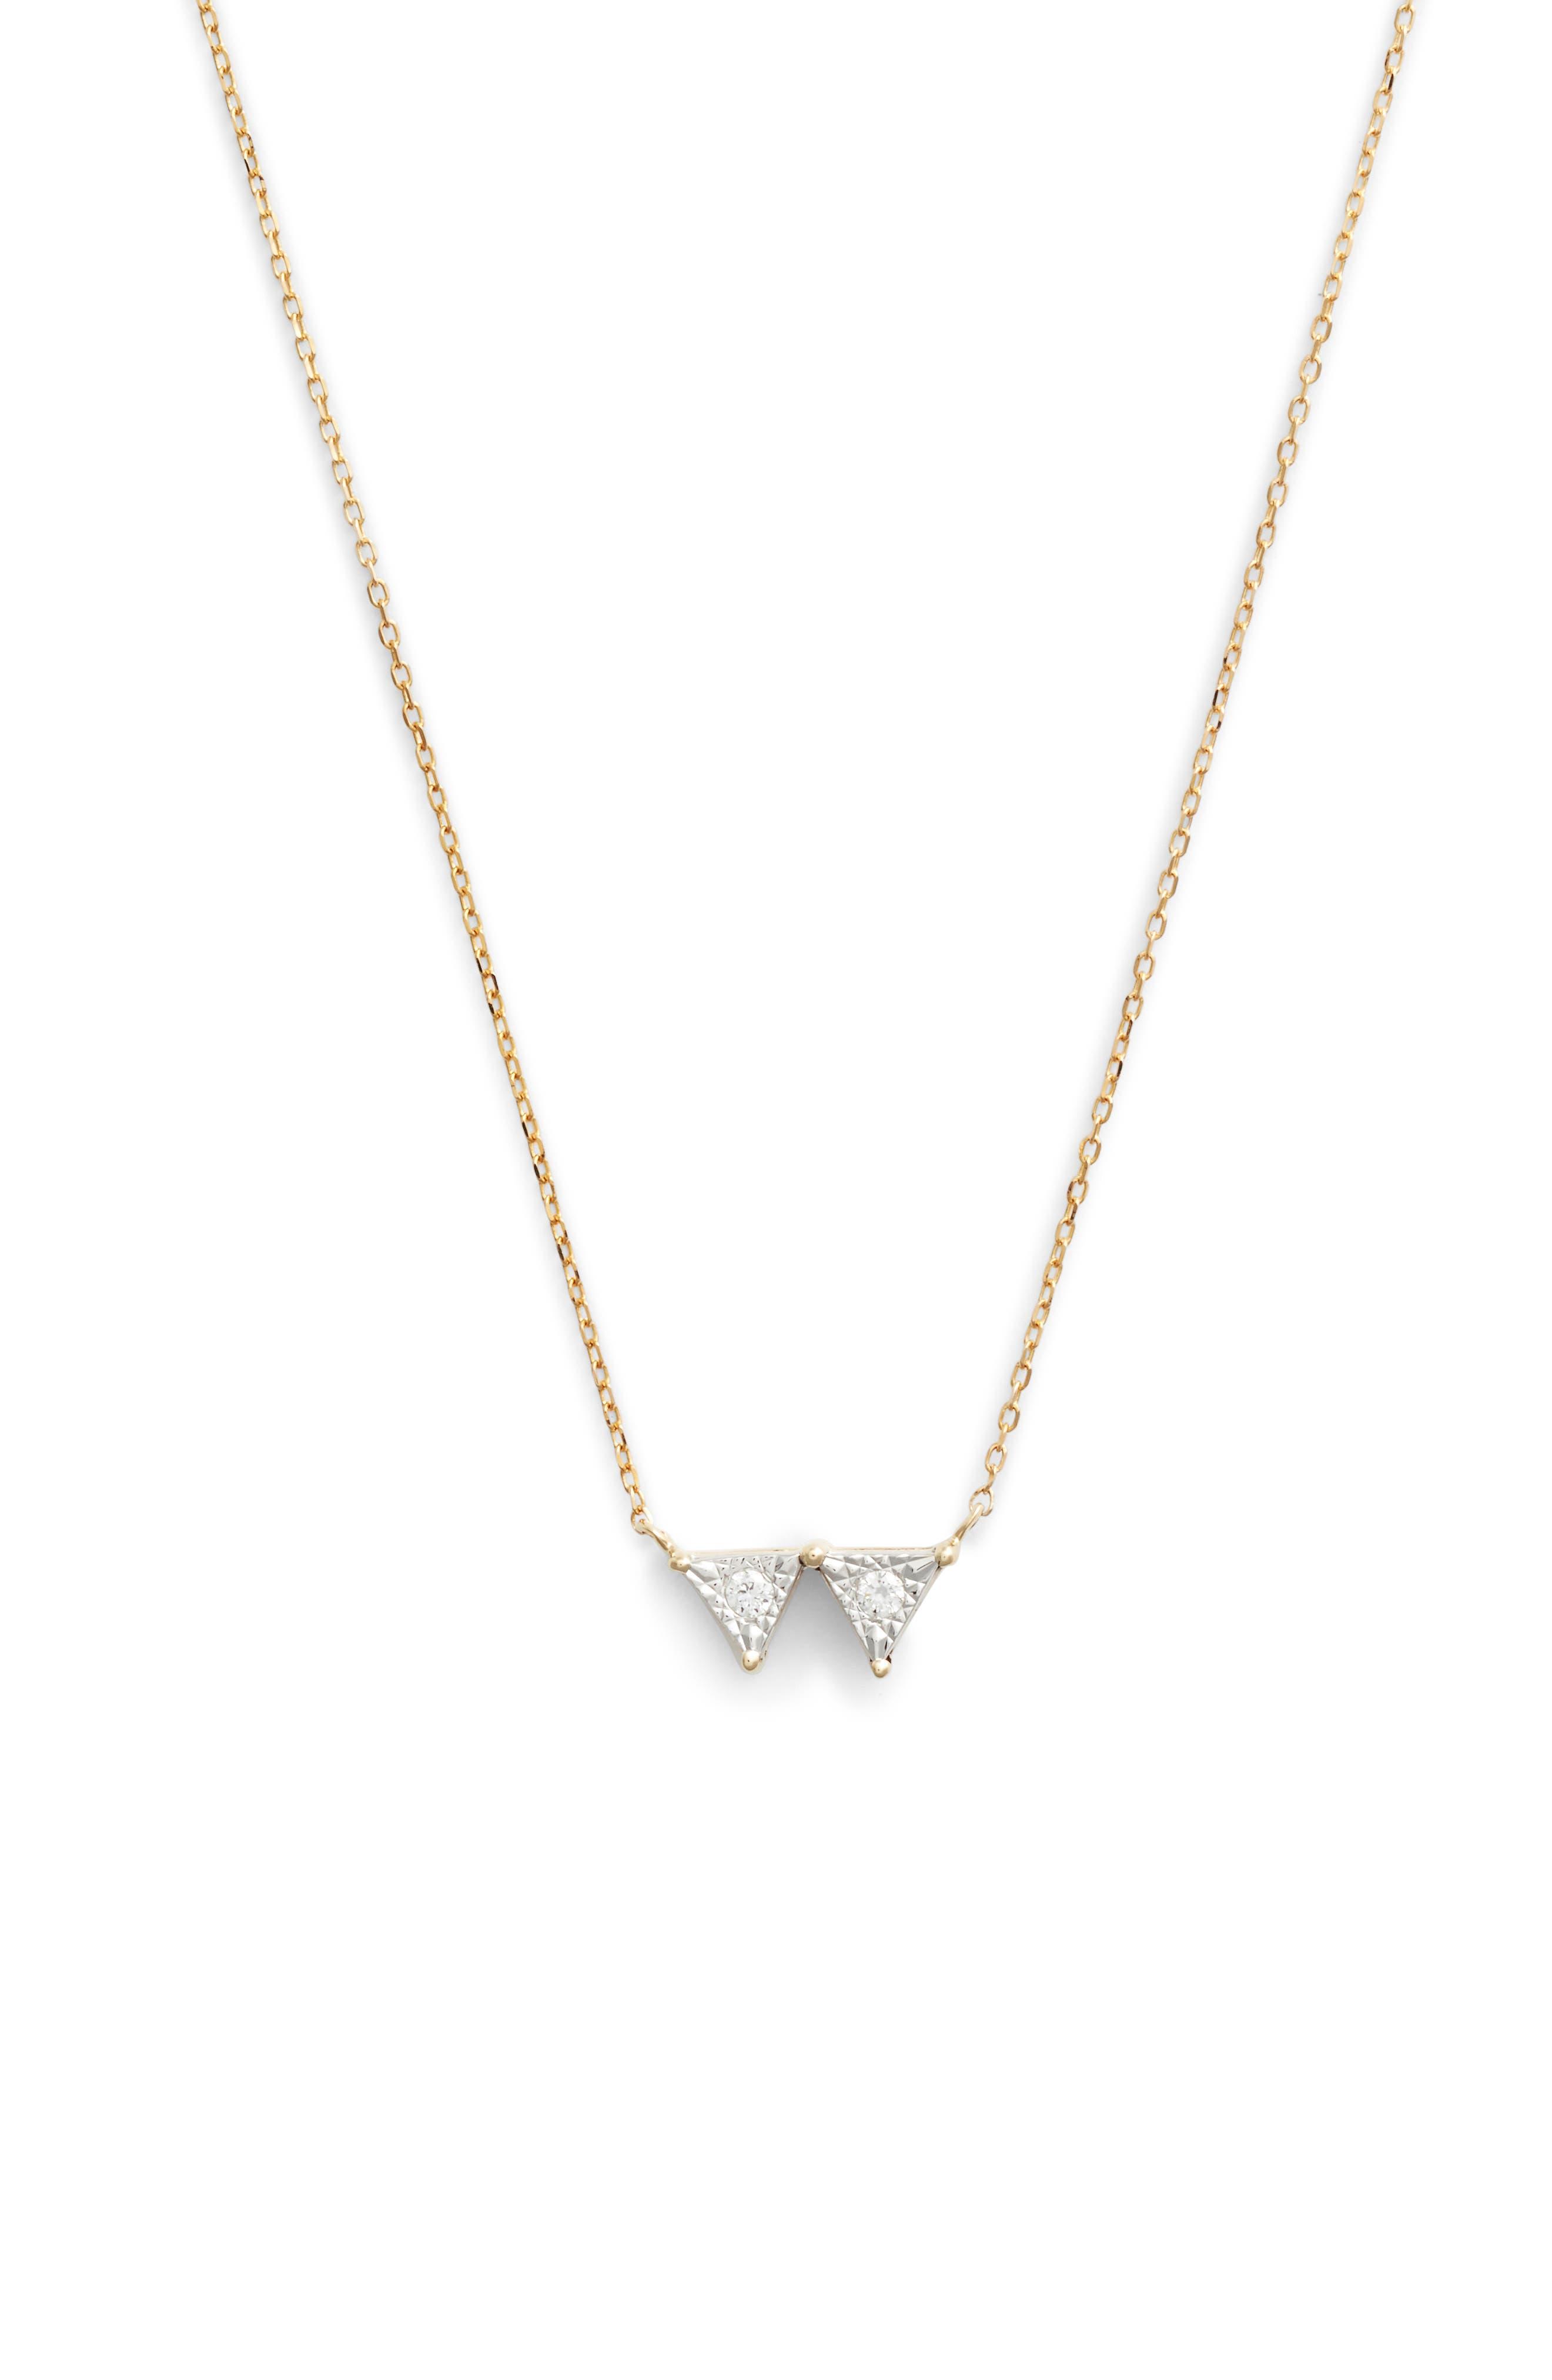 Dana Rebecca Designs Emily Sarah Double Triangle Diamond Necklace